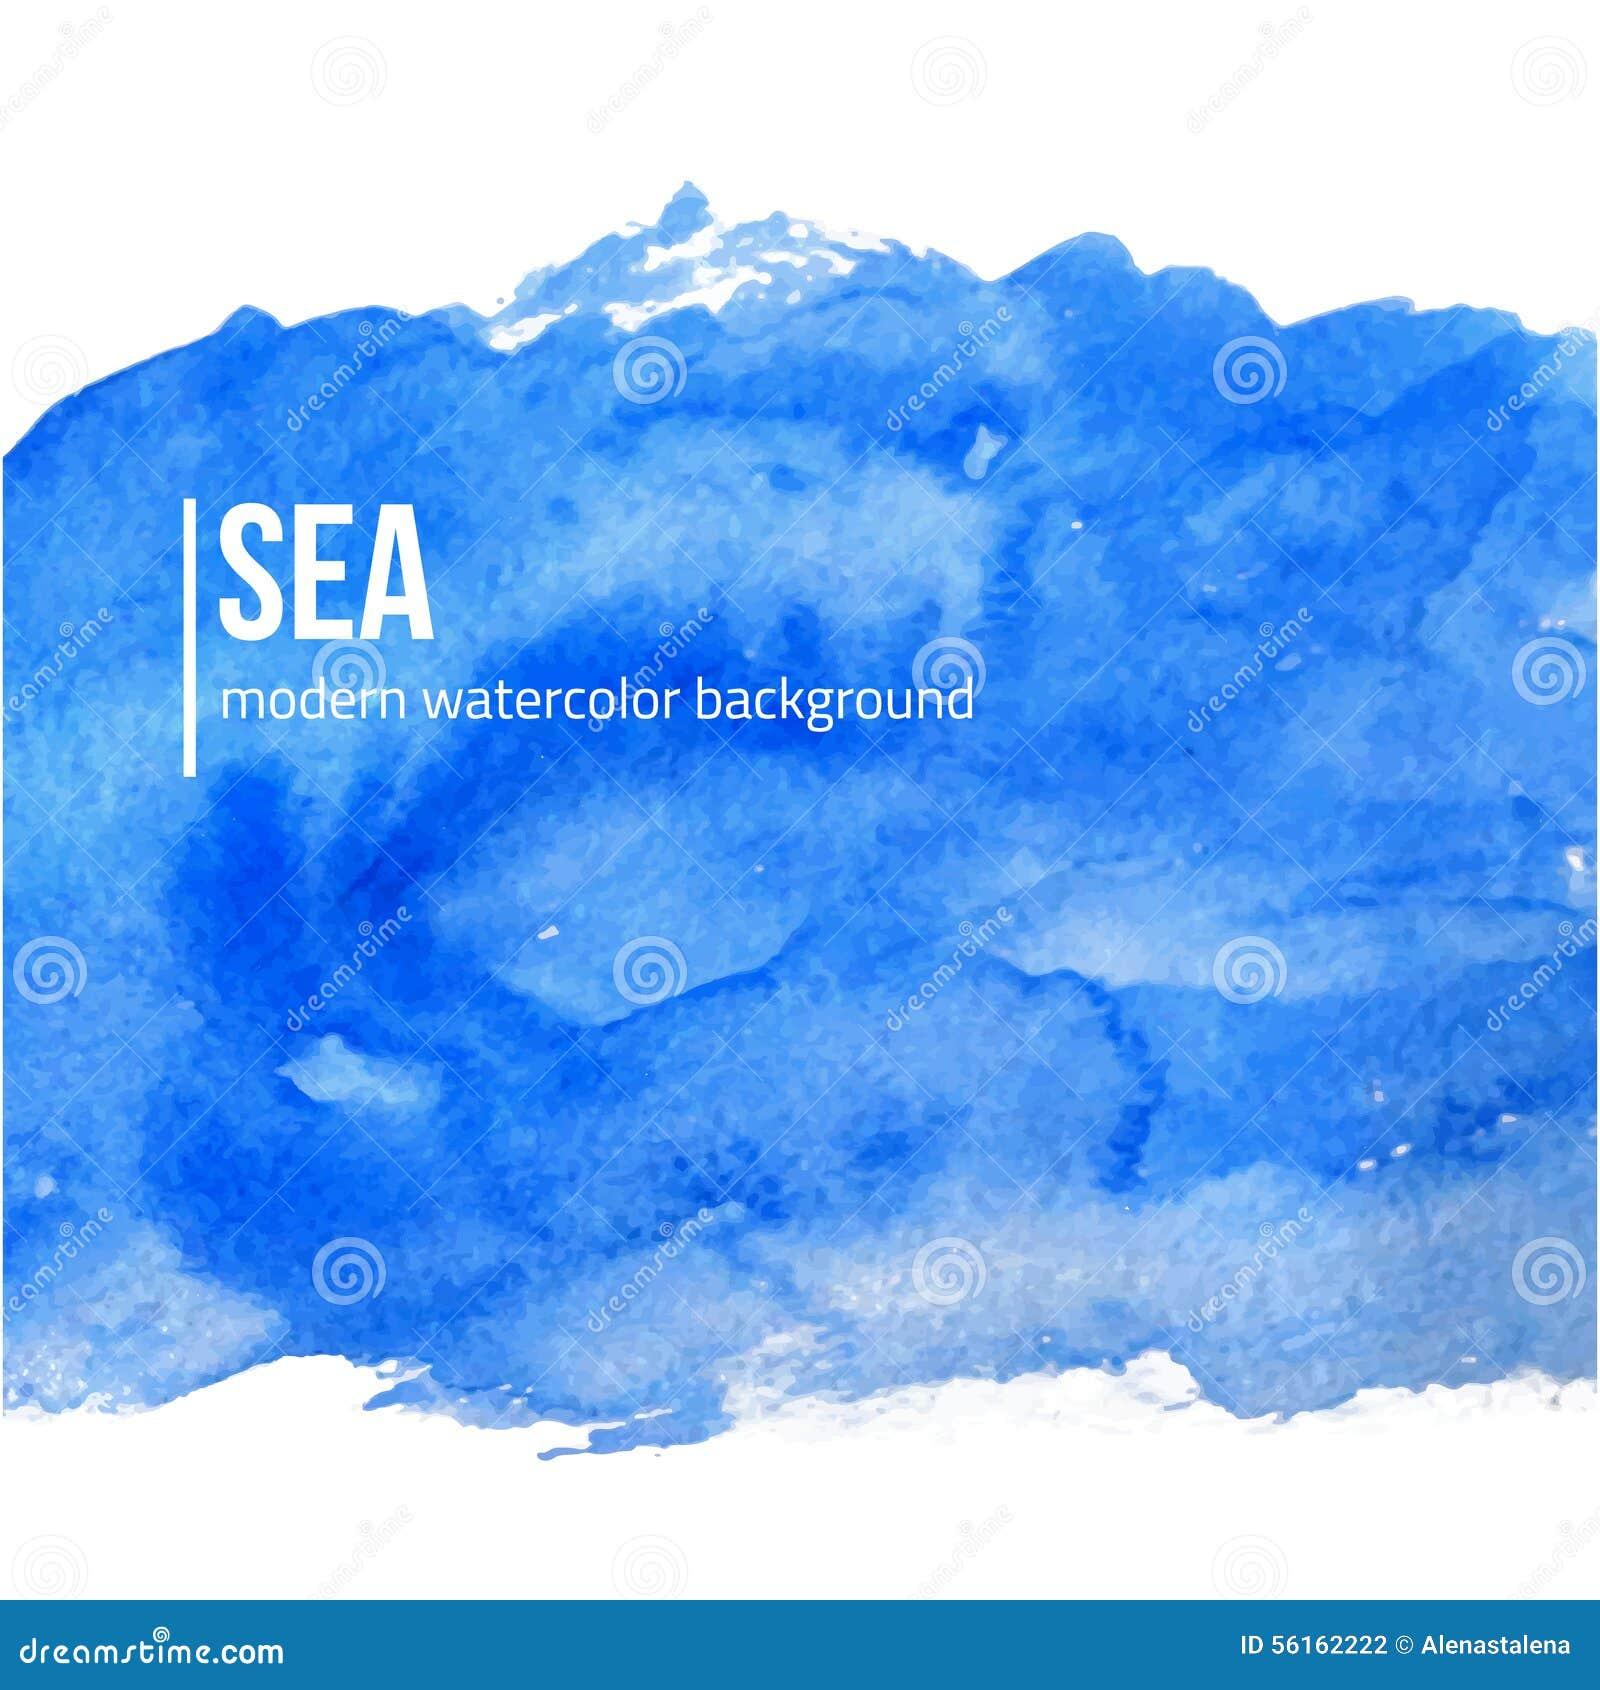 Book Cover Watercolor Brush : Dirigez le fond la mer ou ciel bleue d aquarelle